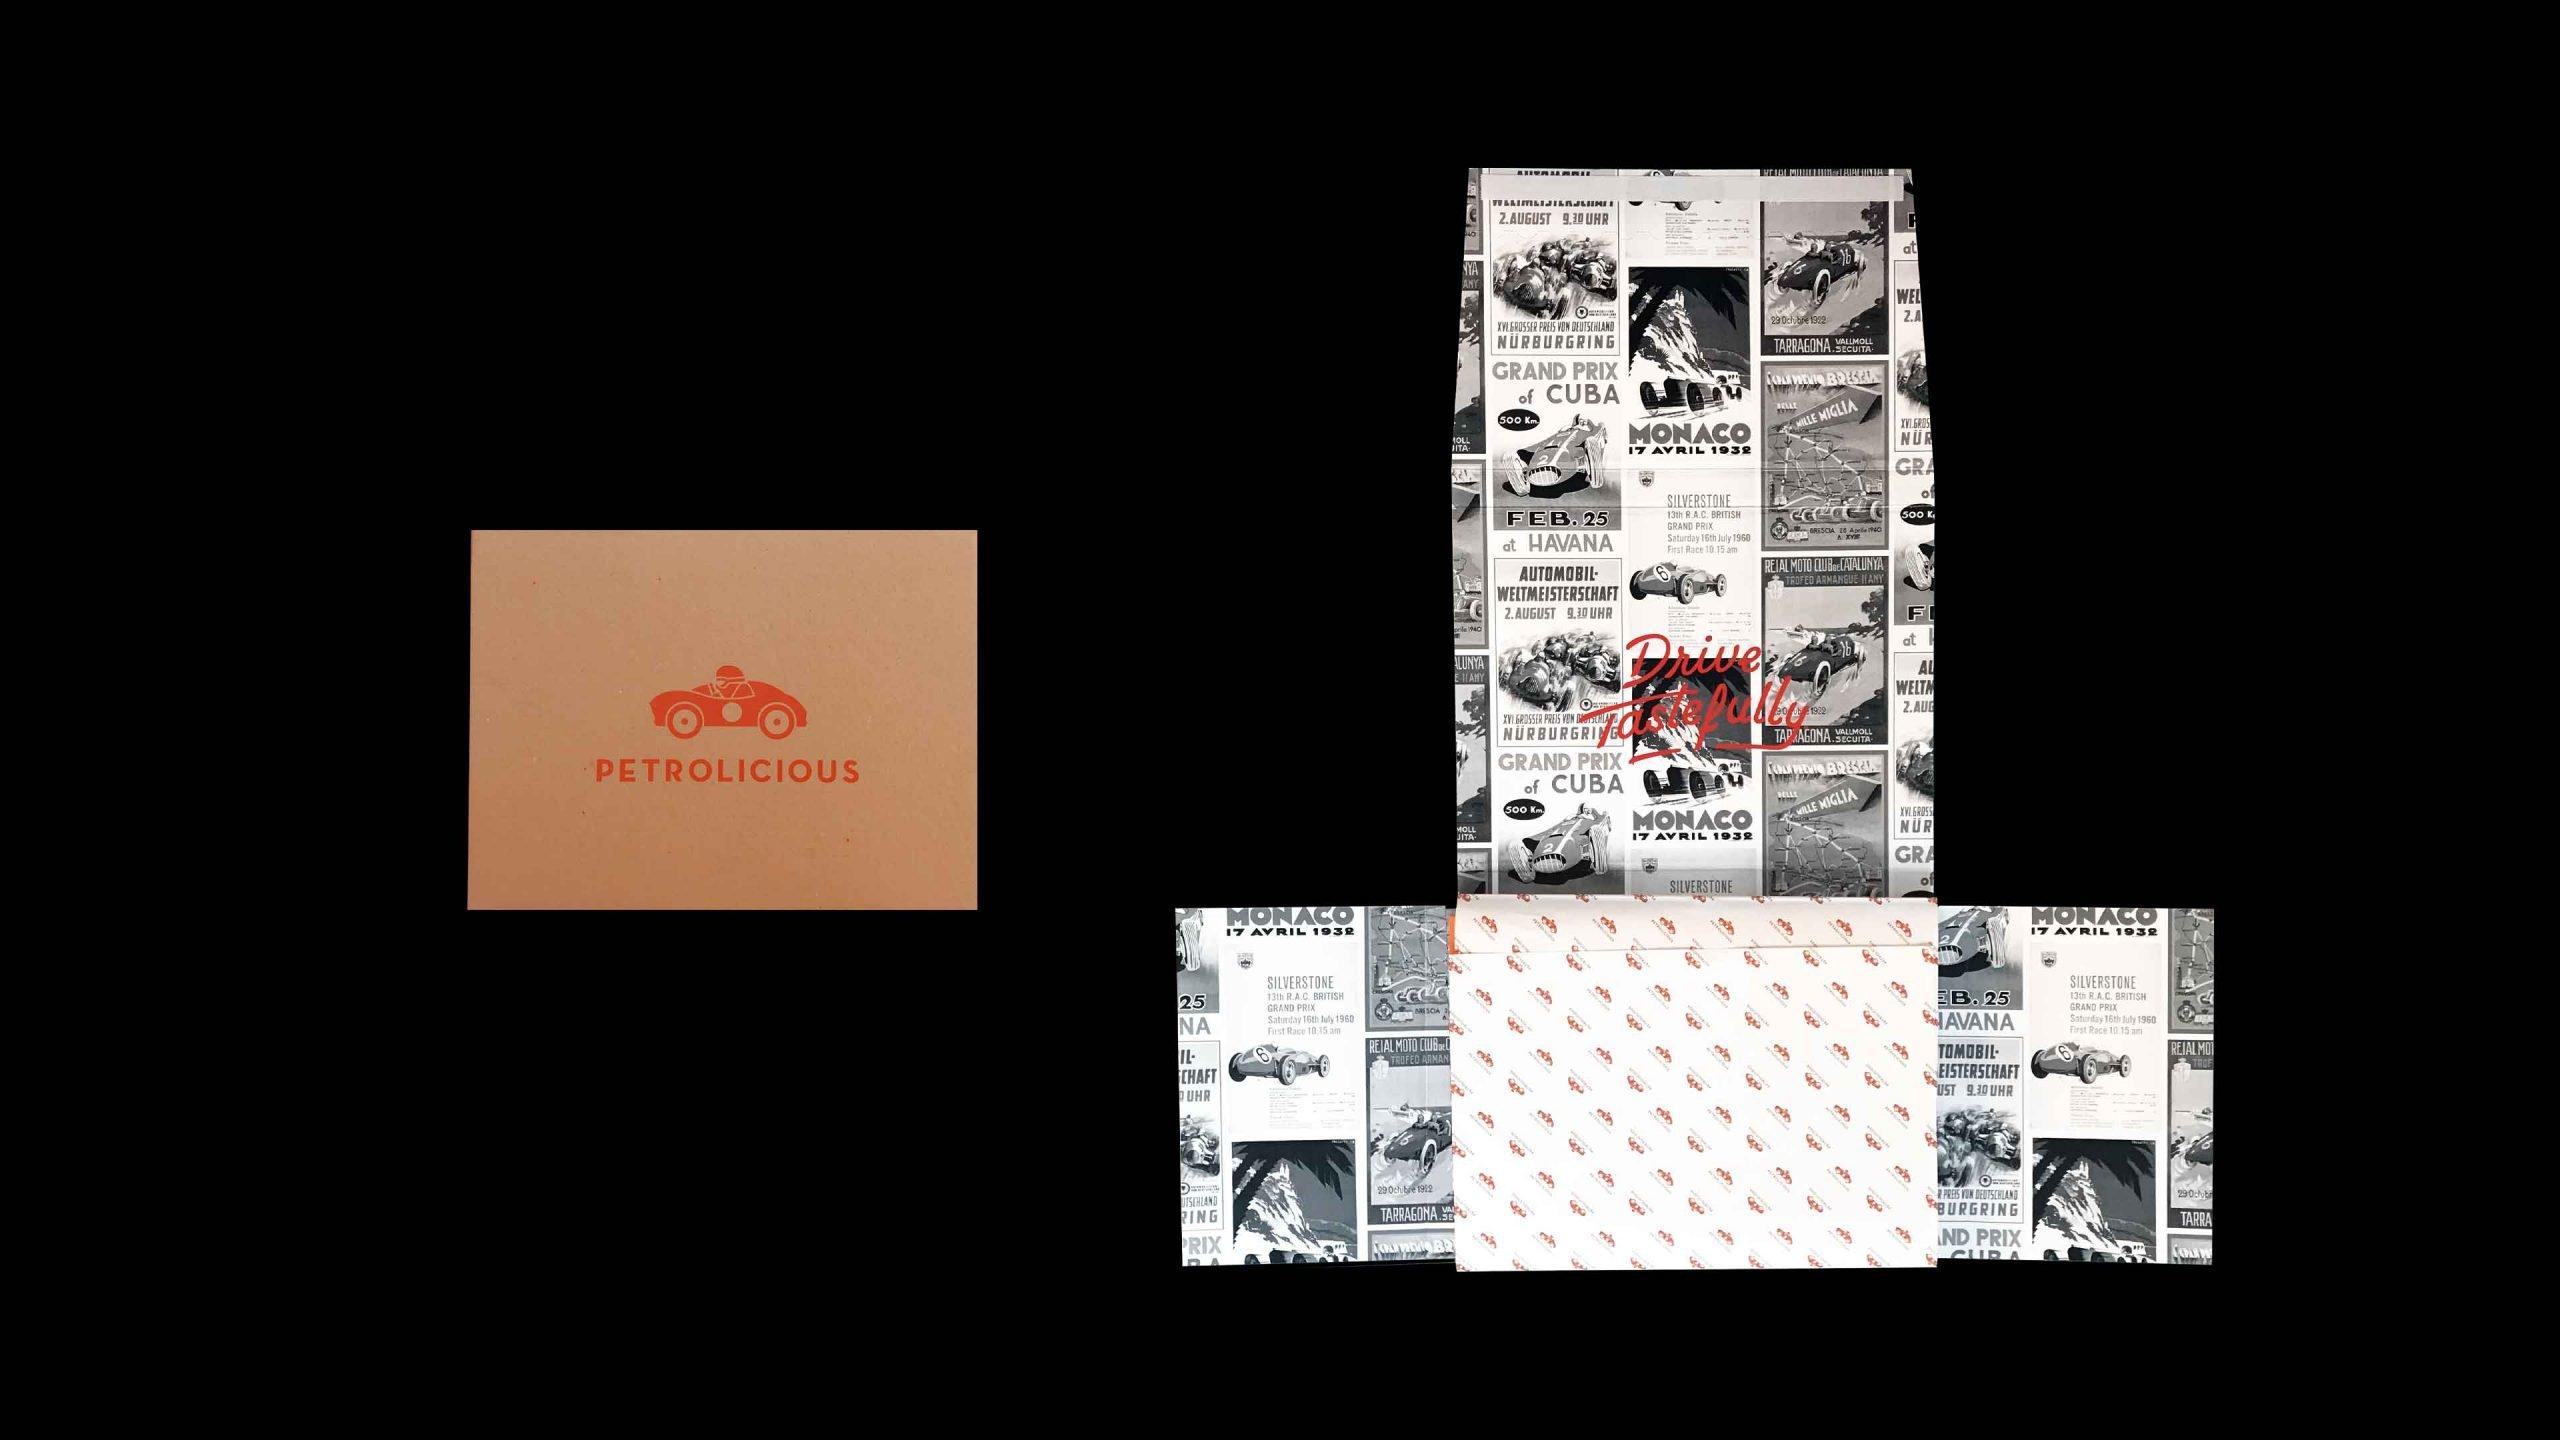 PETROLICIOUS-magazine-design-06